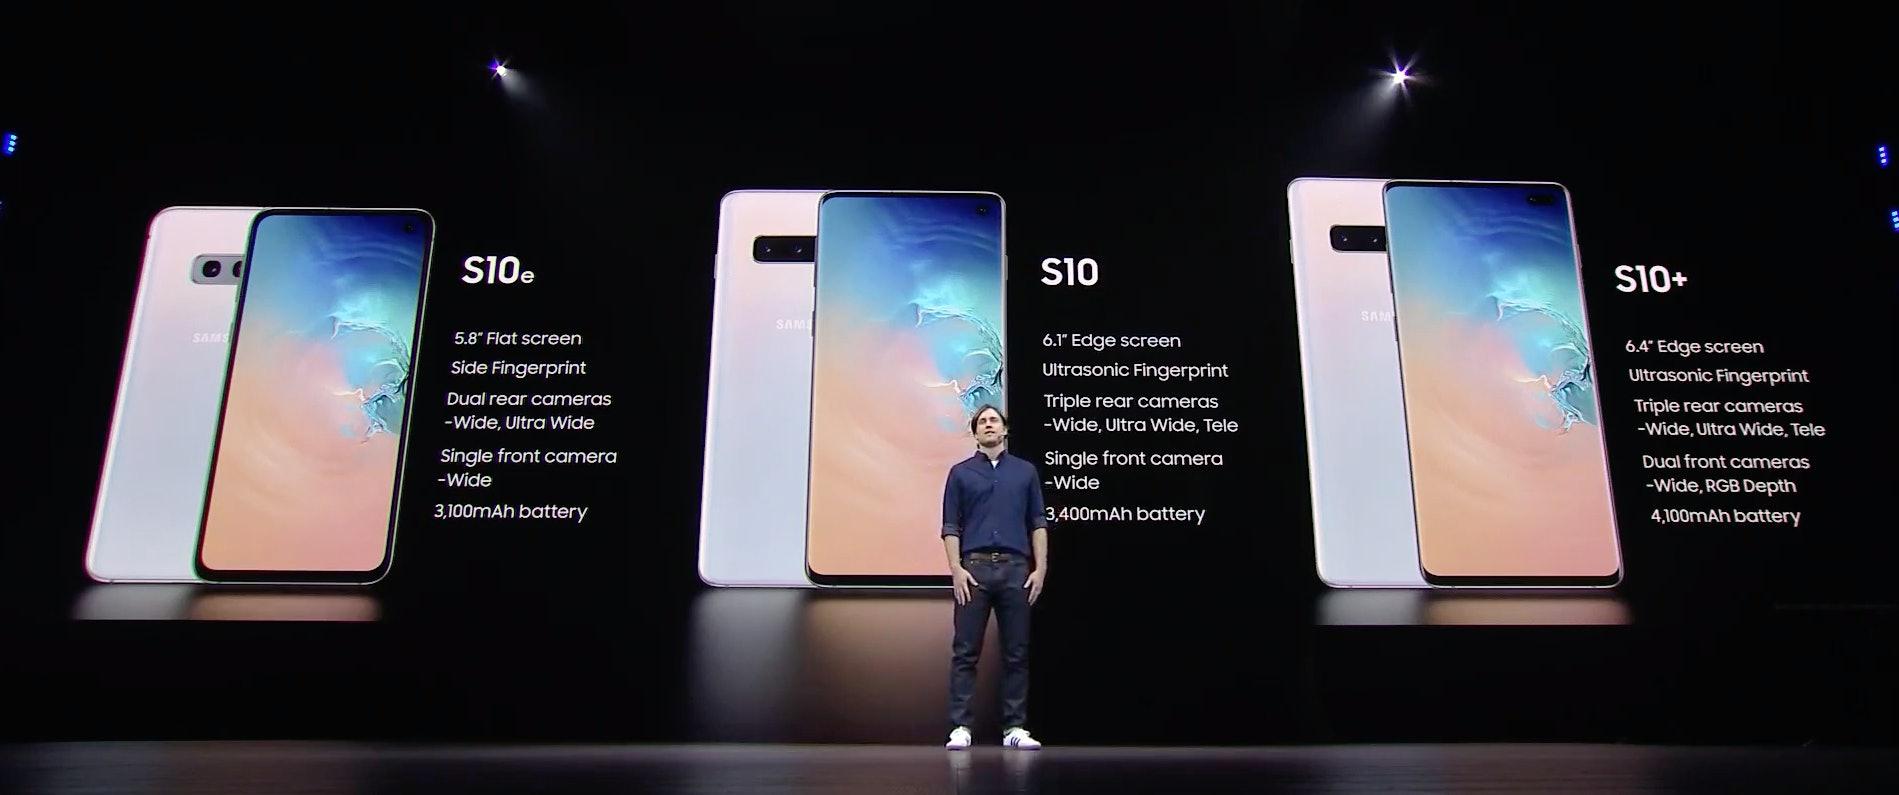 samsung S10 models